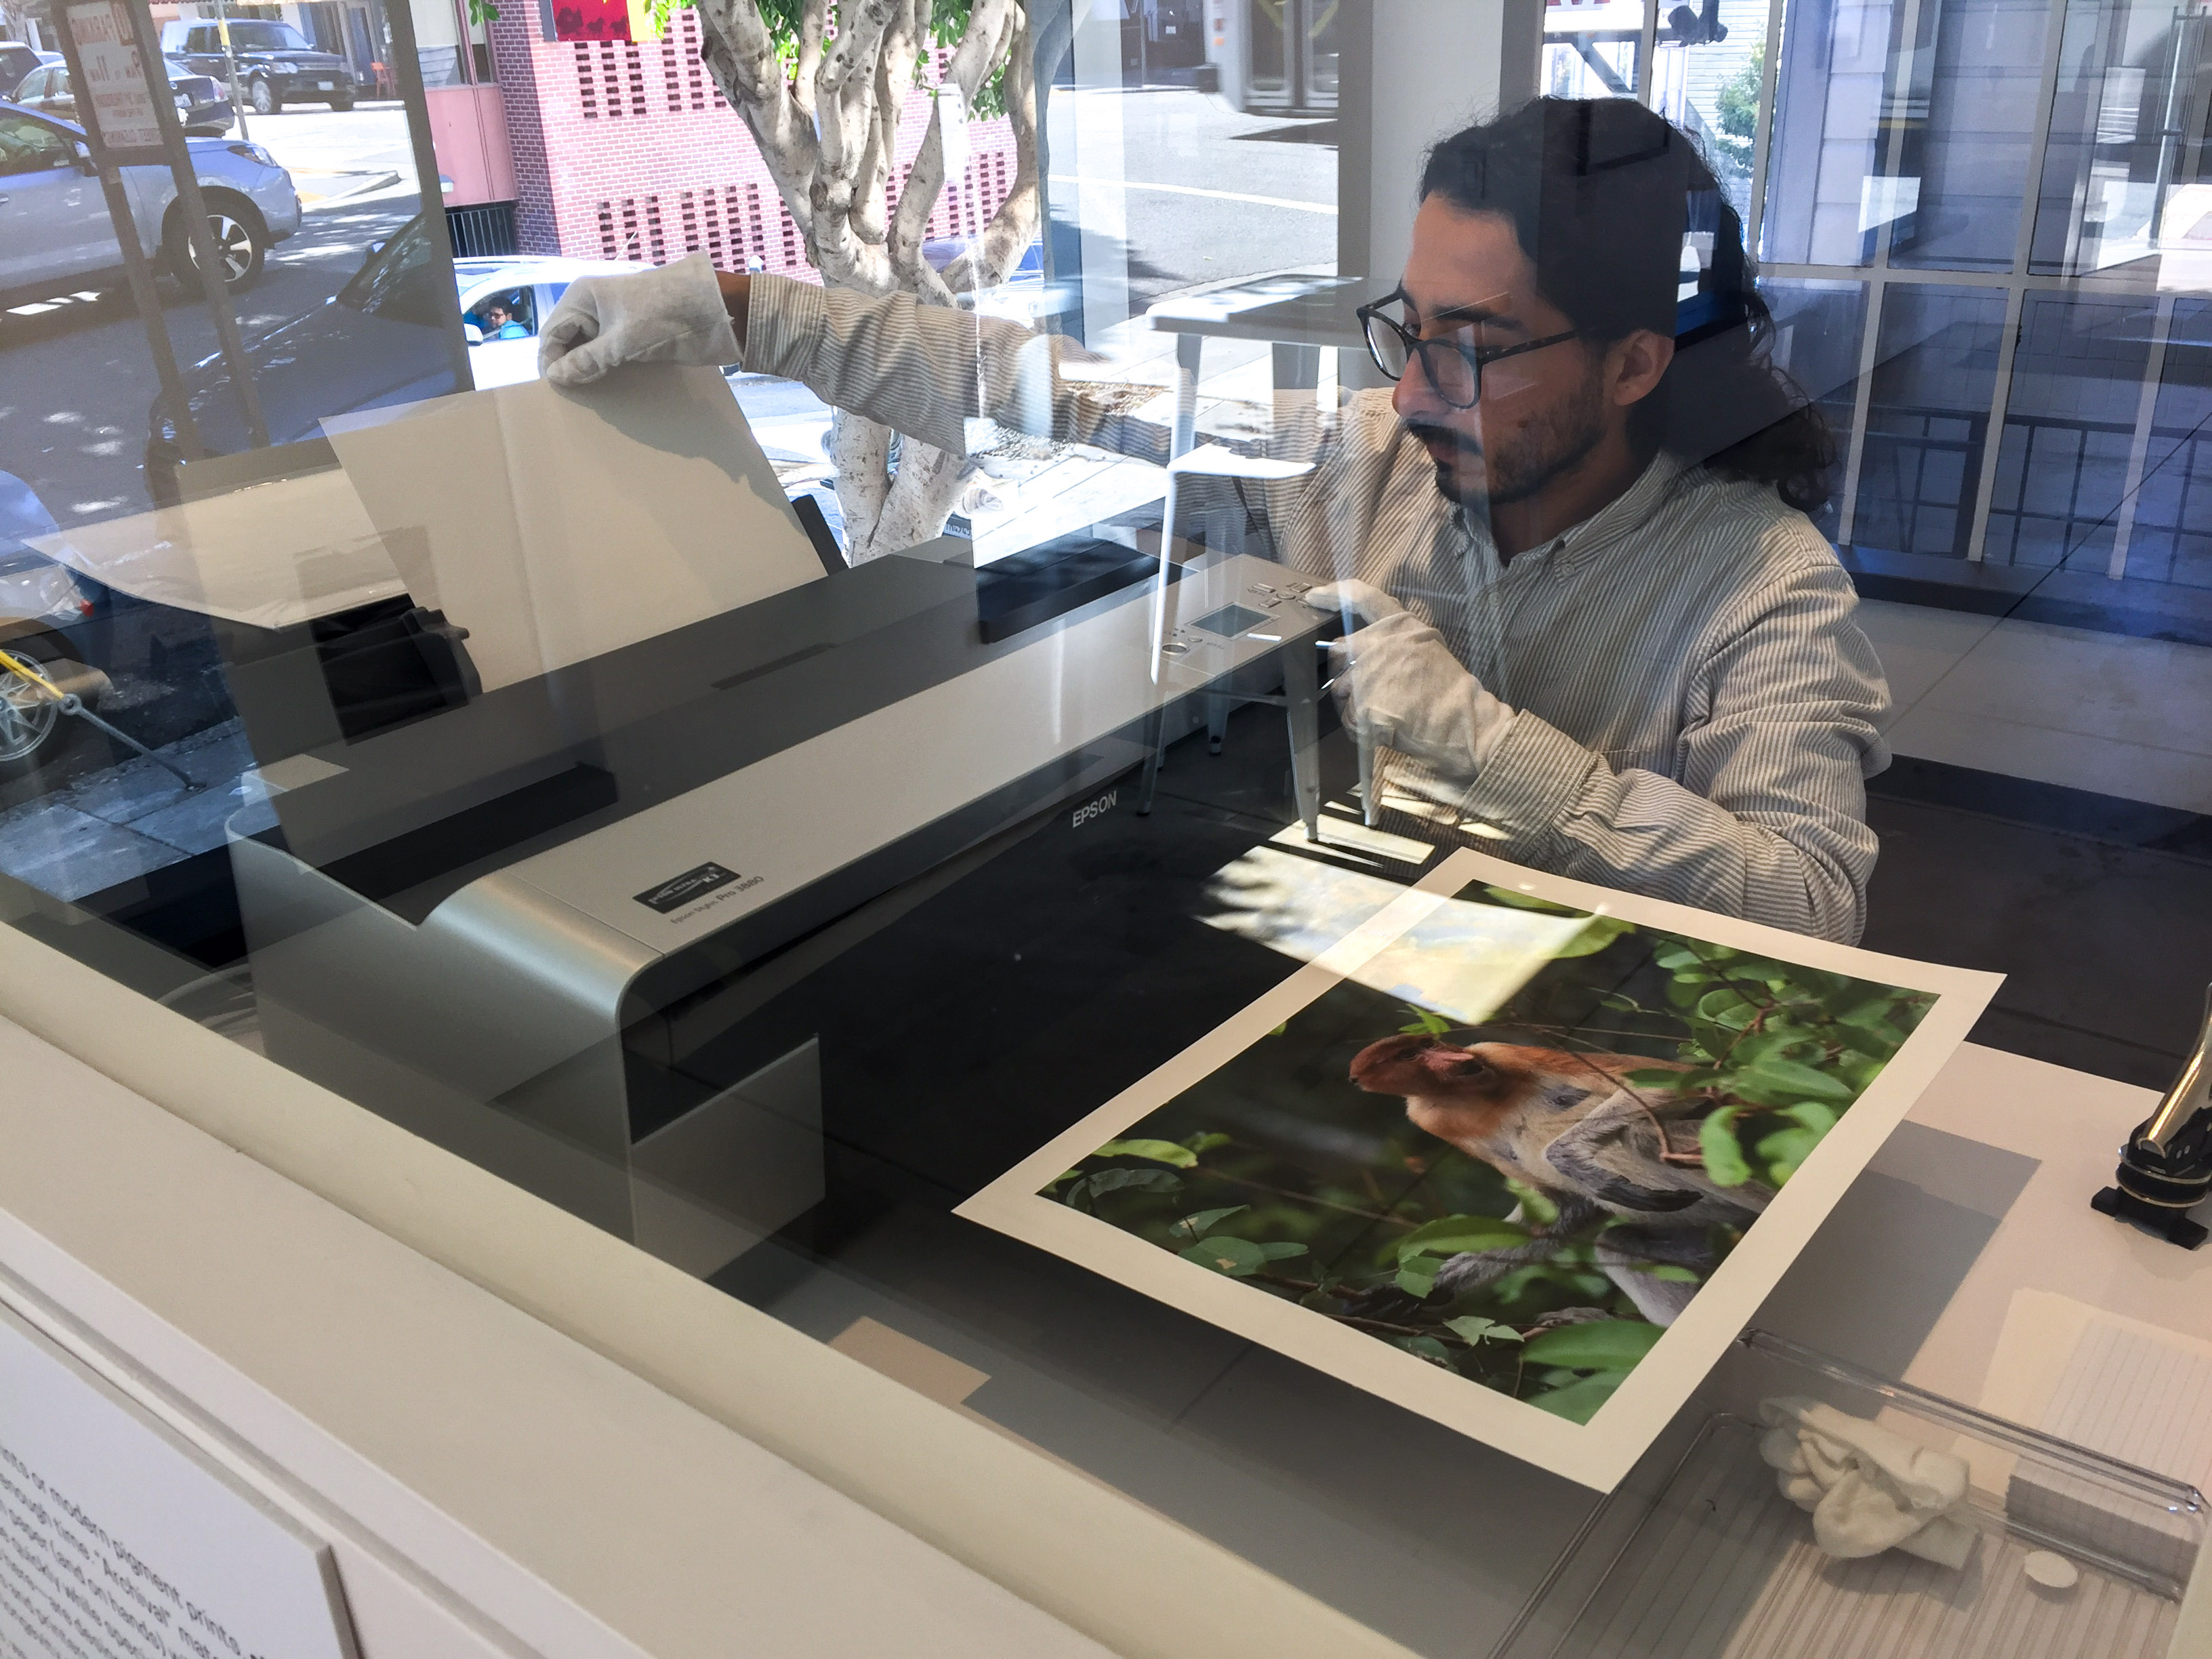 Neomodern concierge printing process